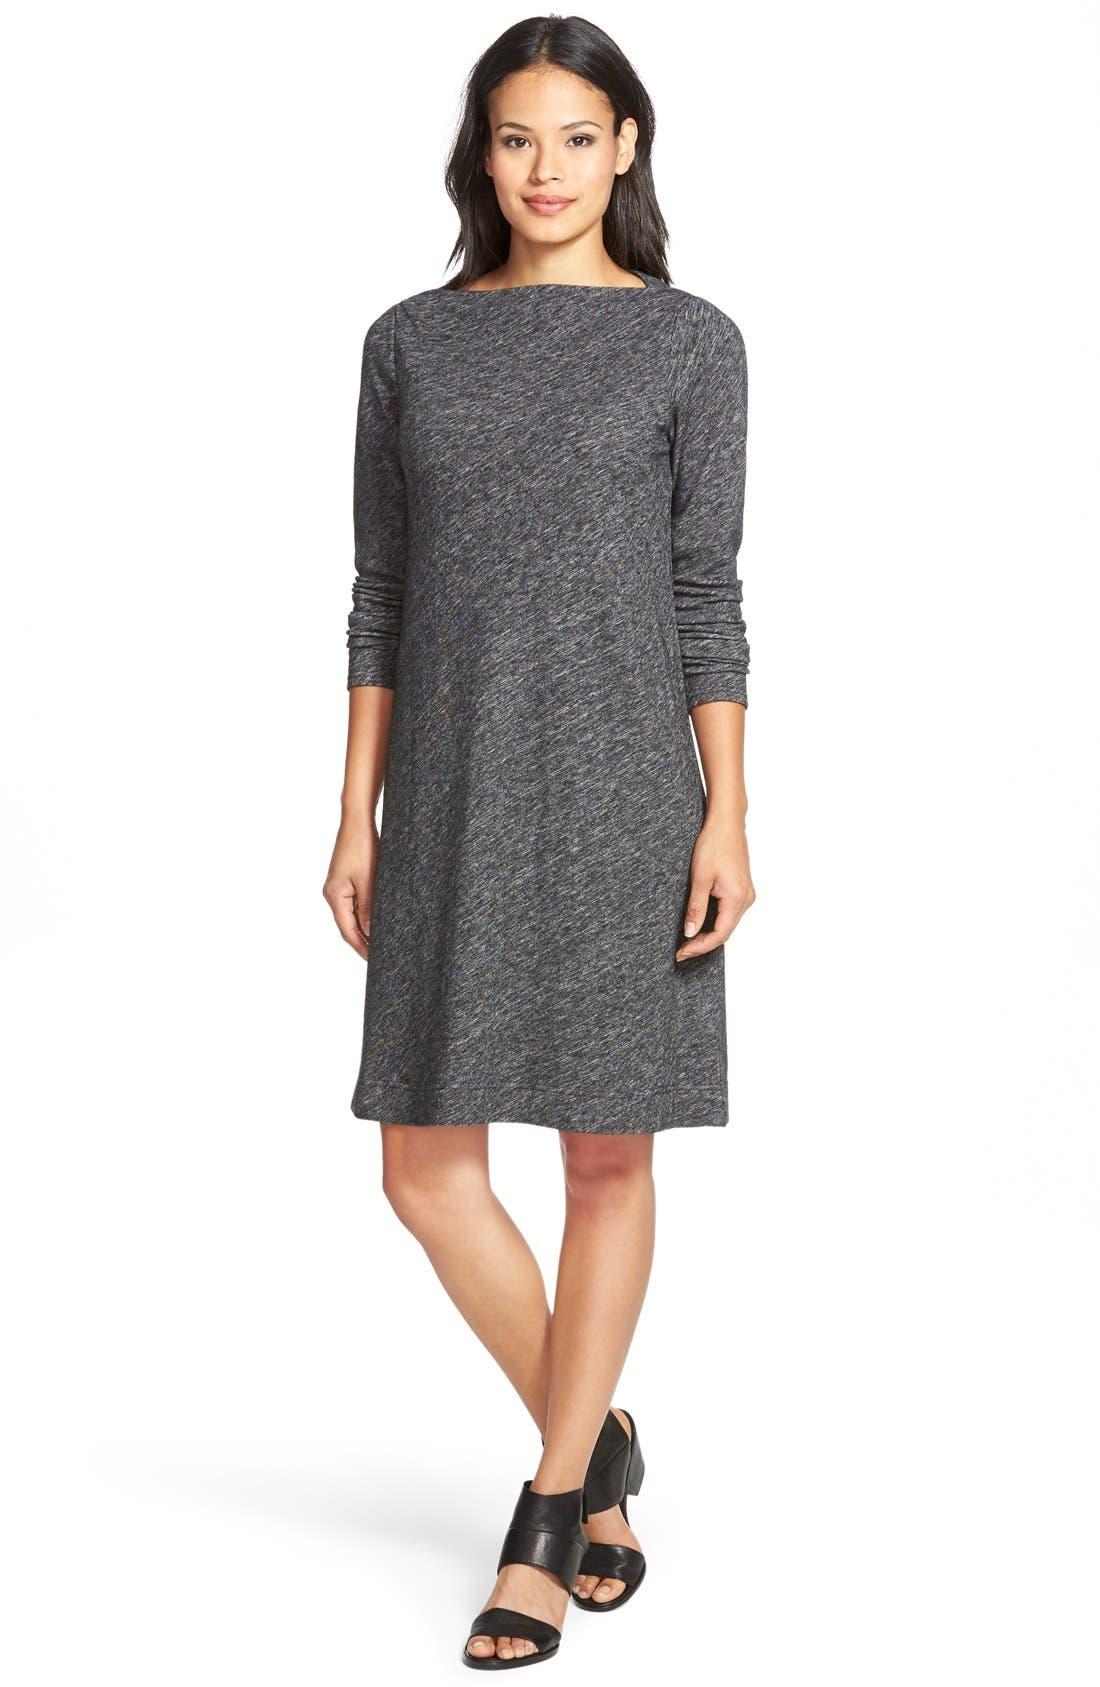 Main Image - Eileen Fisher Bateau Neck Knit ShiftDress (Regular & Petite)